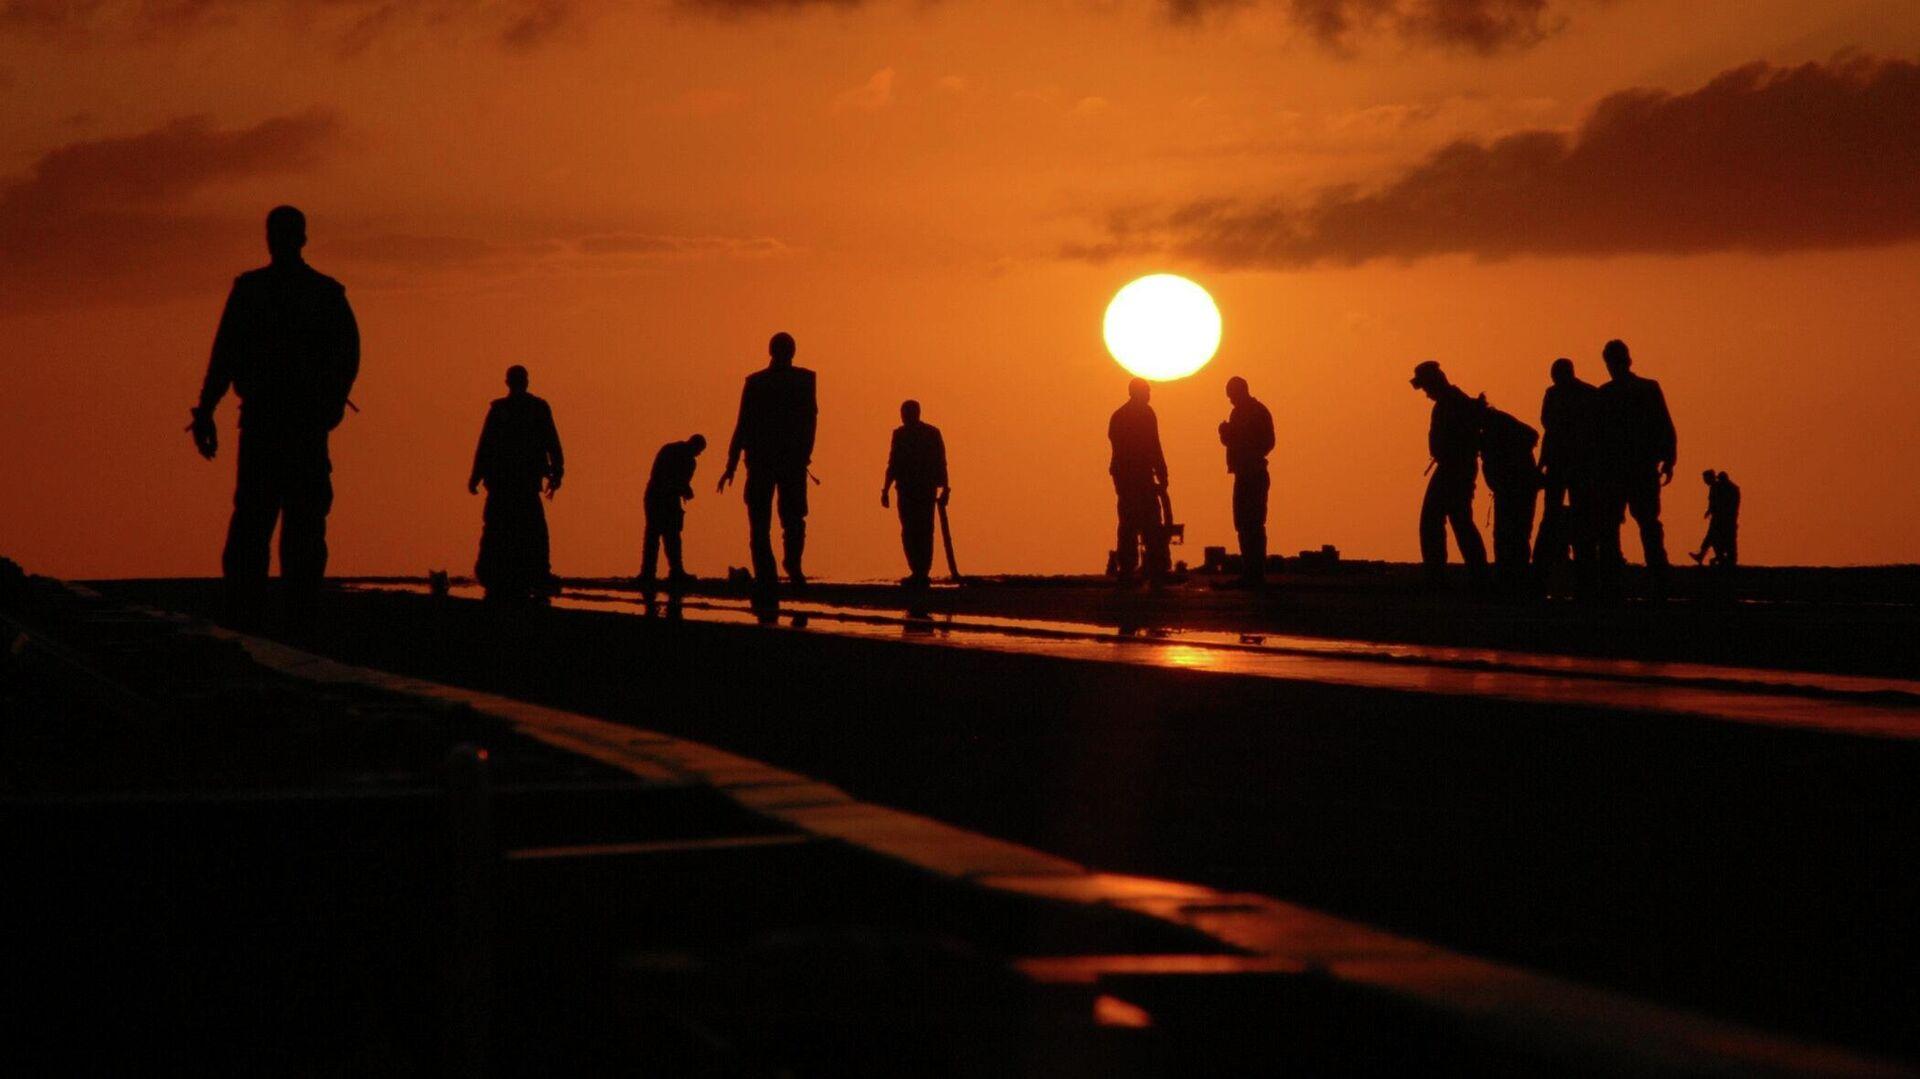 Силуэты мужчин на фоне заката - Sputnik Ўзбекистон, 1920, 30.09.2021